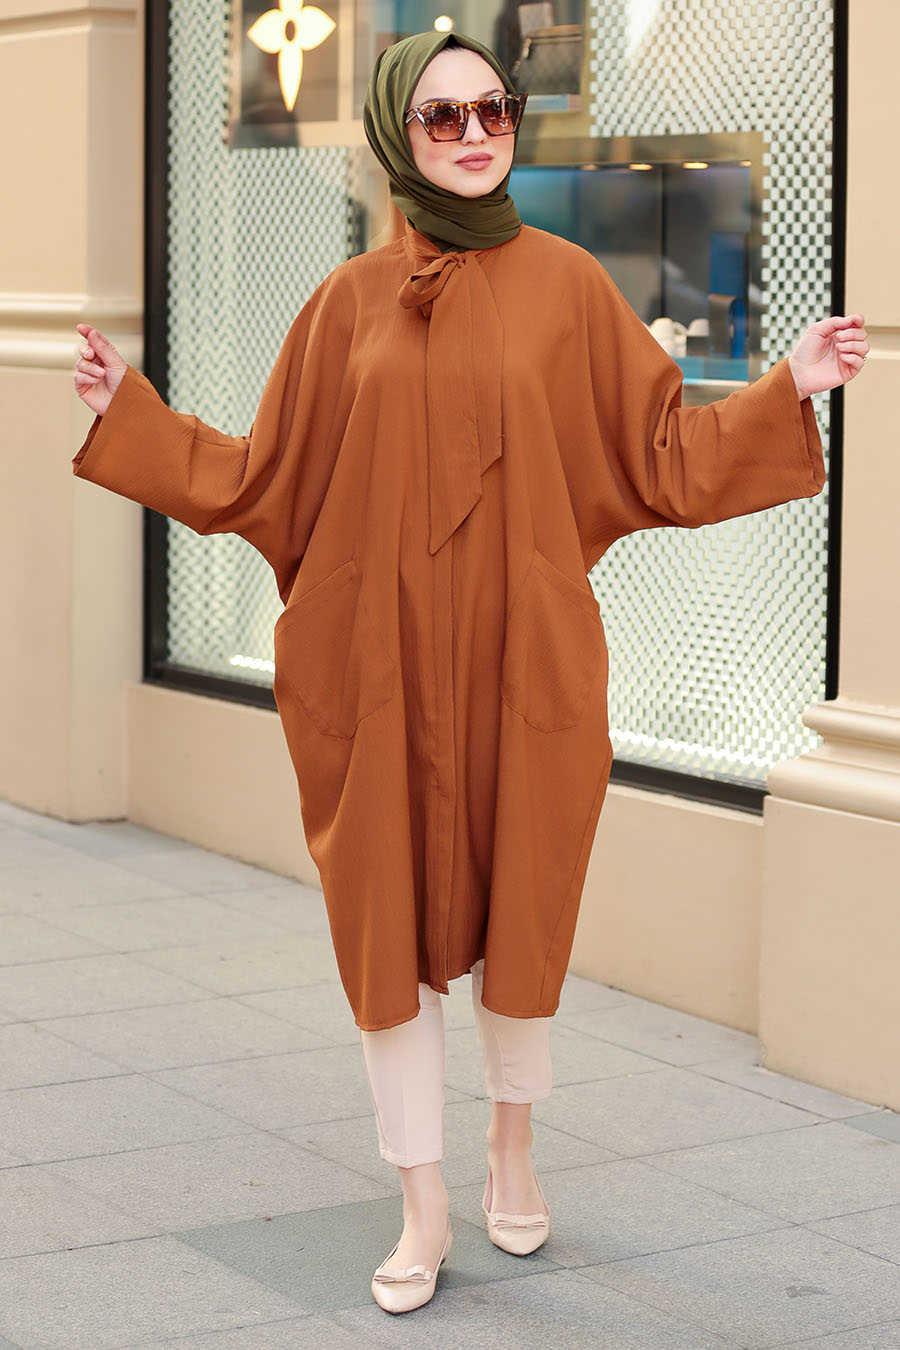 Neva Style - Snuff Colored Hijab Tunic 5003TB